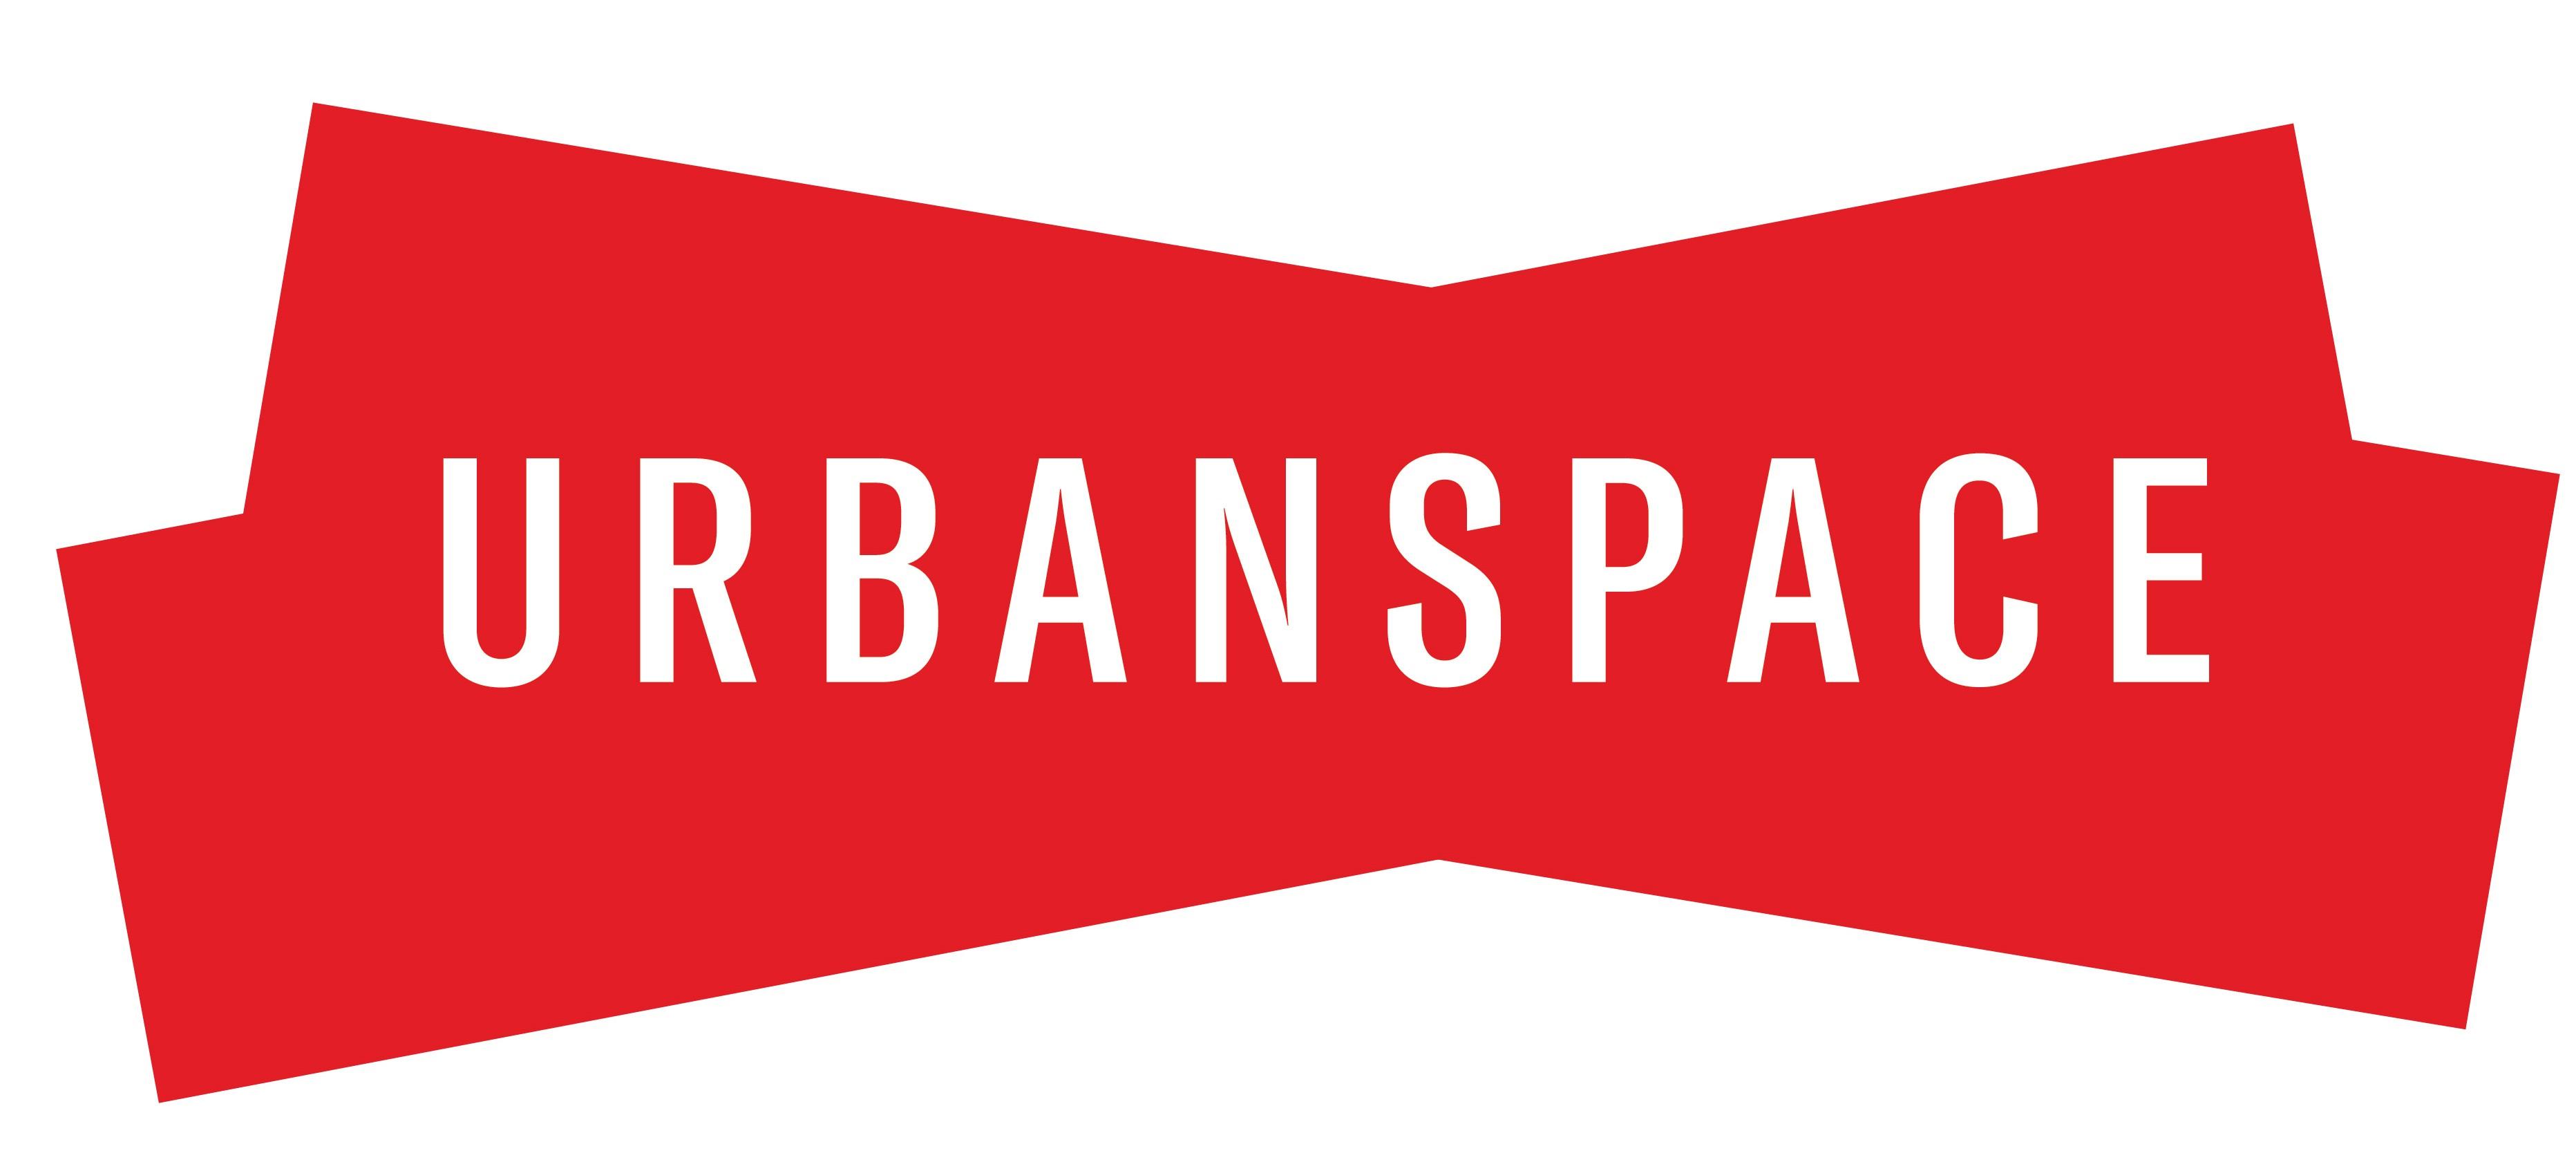 Urbanspace logo